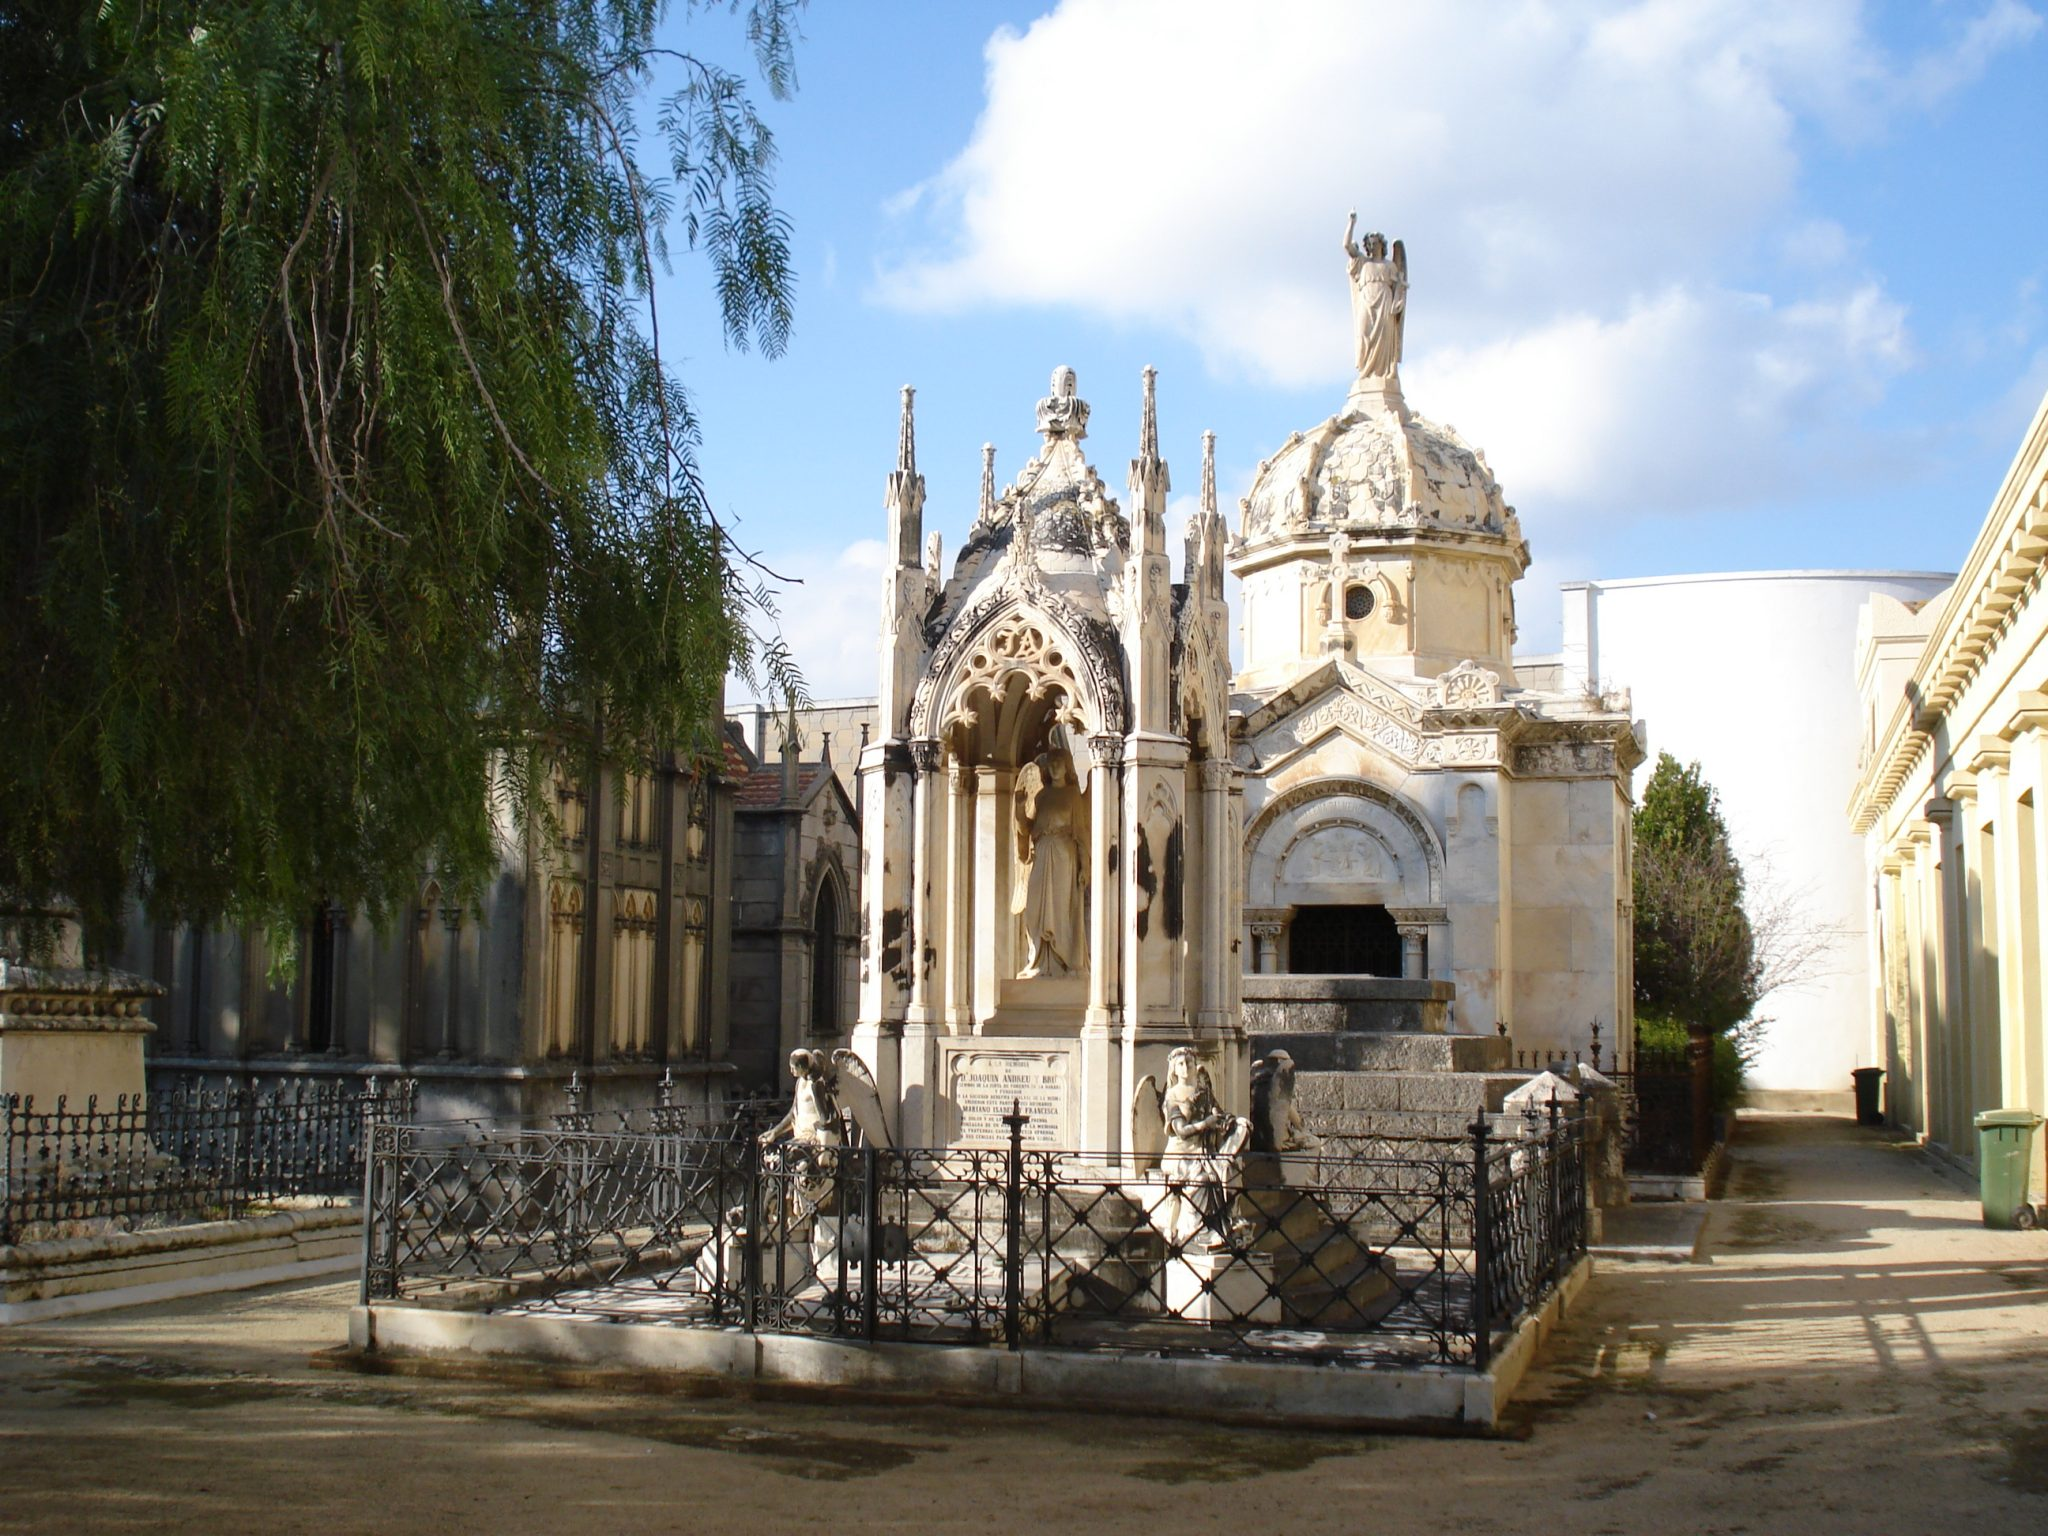 Municipal Cemetery of the Capuchins (Mataró, Barcelona)